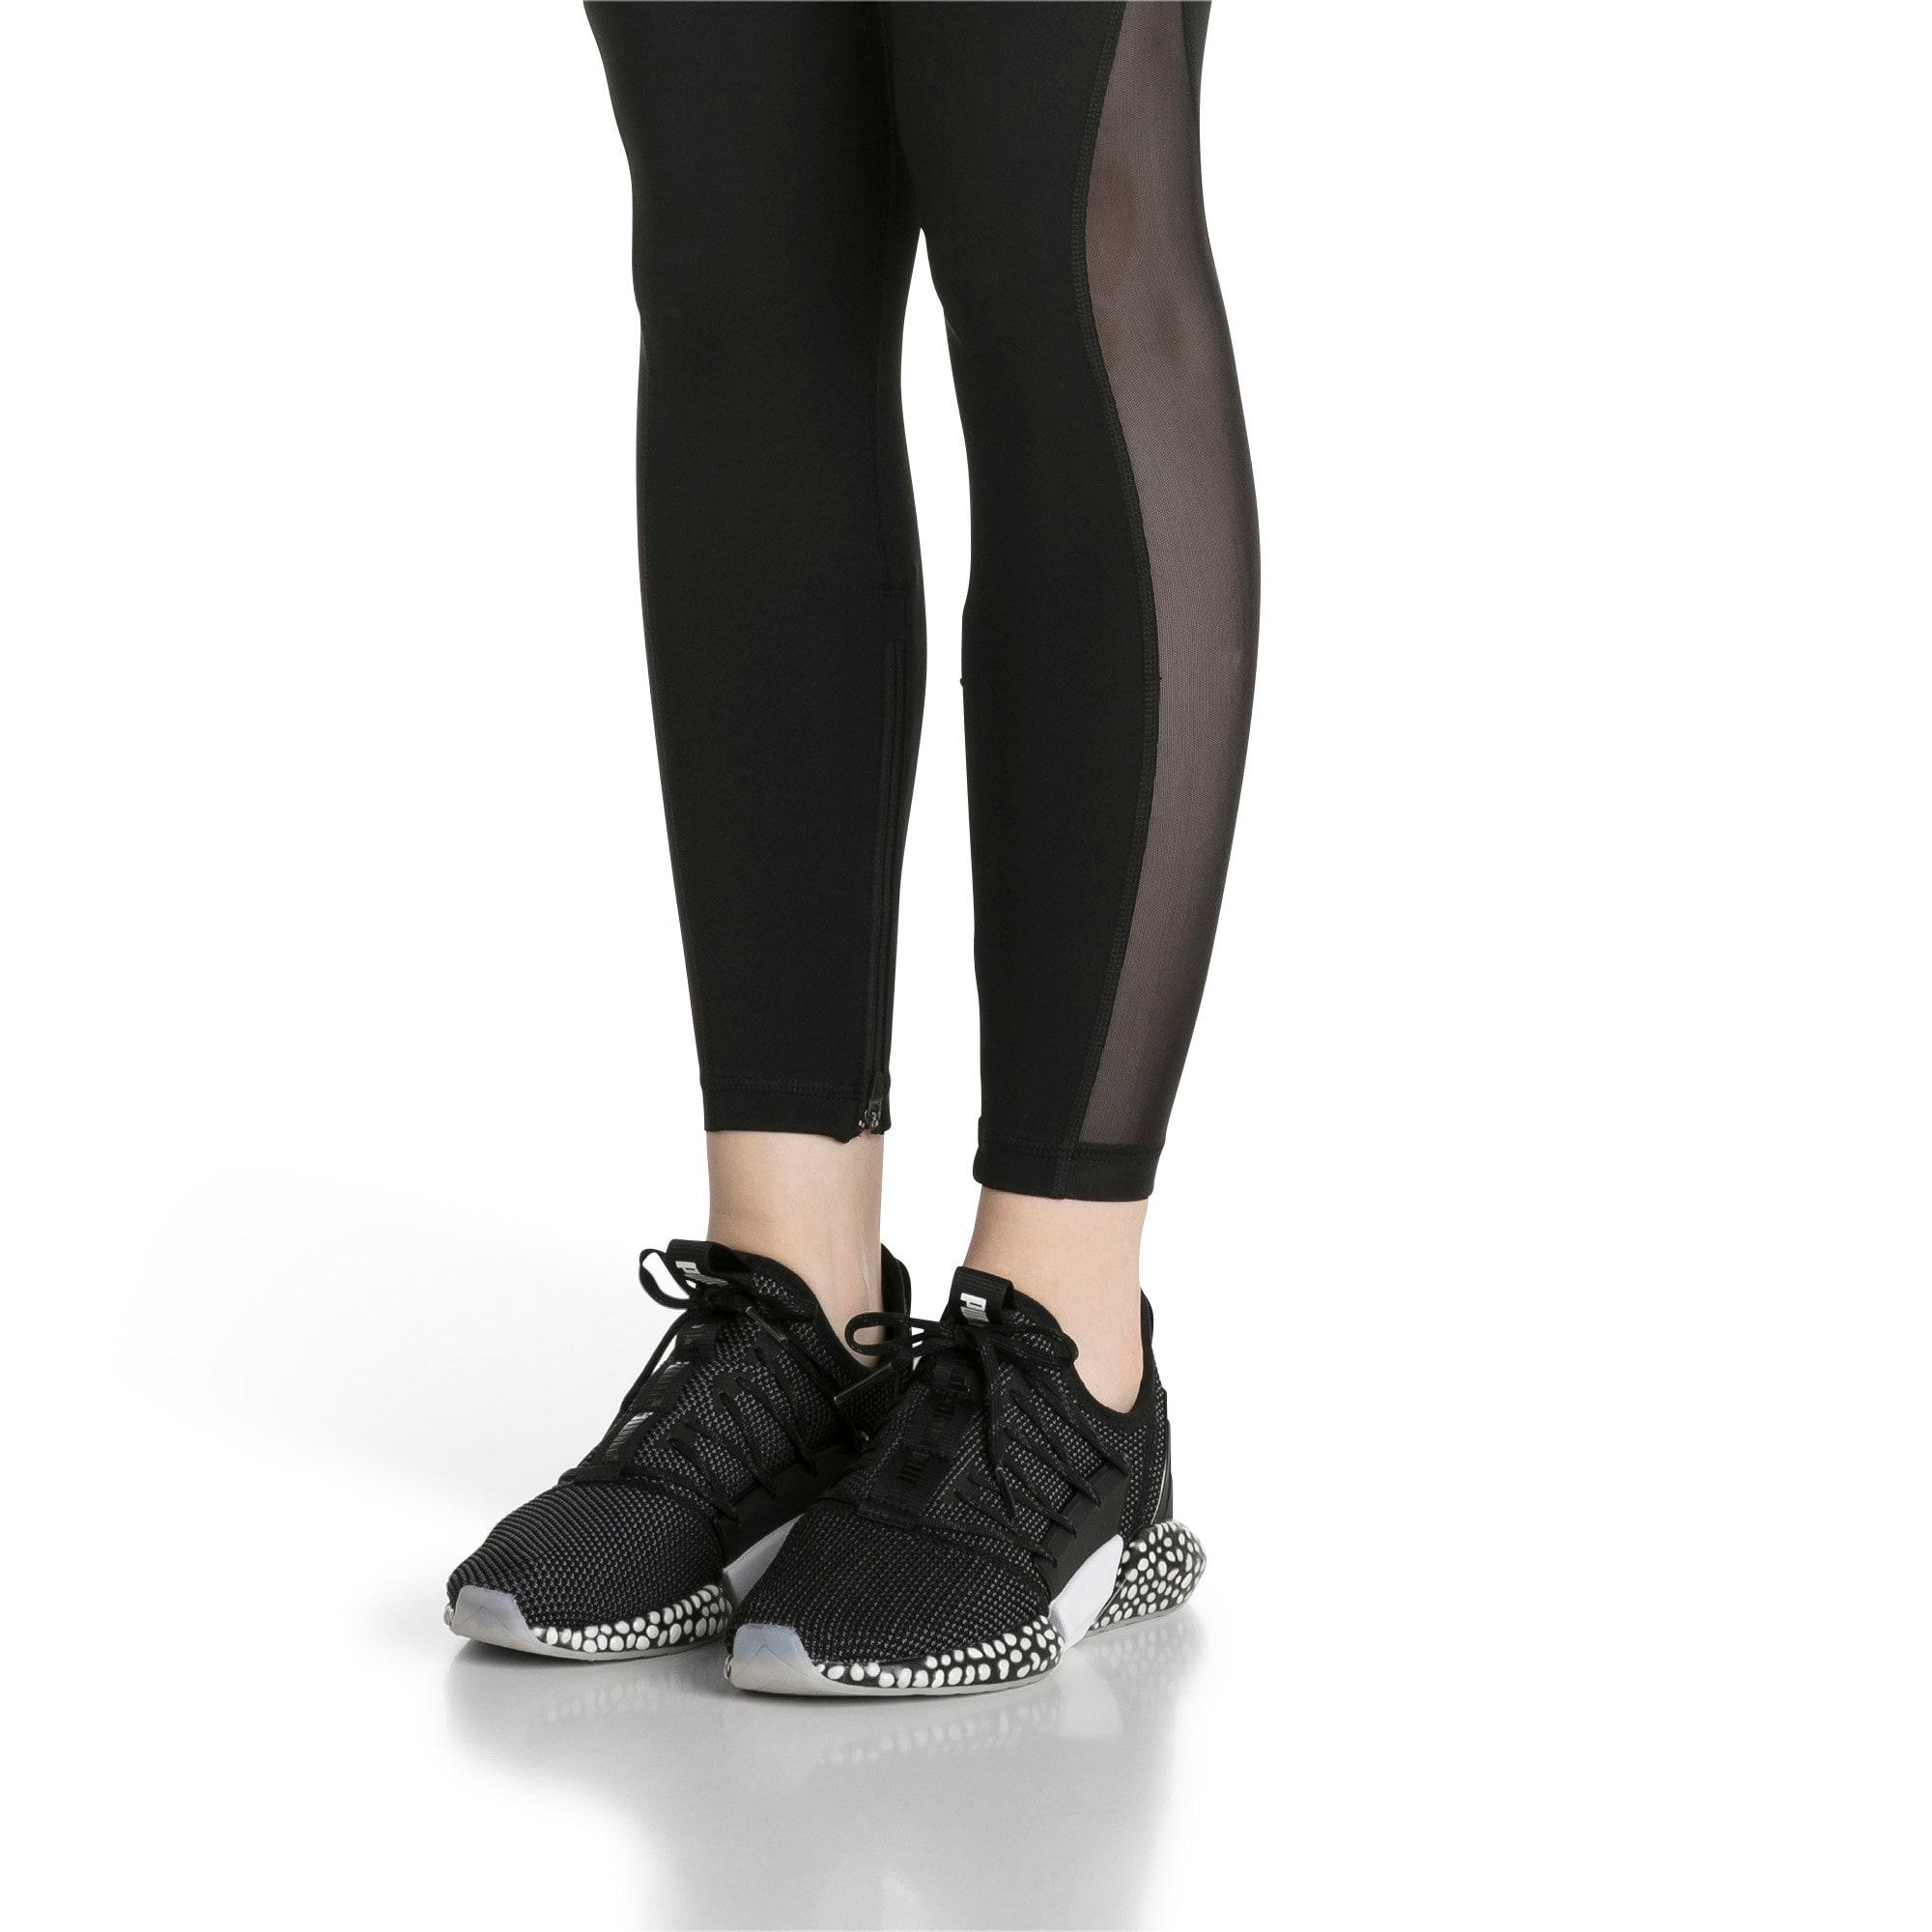 HYBRID Rocket Runner Women's Running Shoes   PUMA US